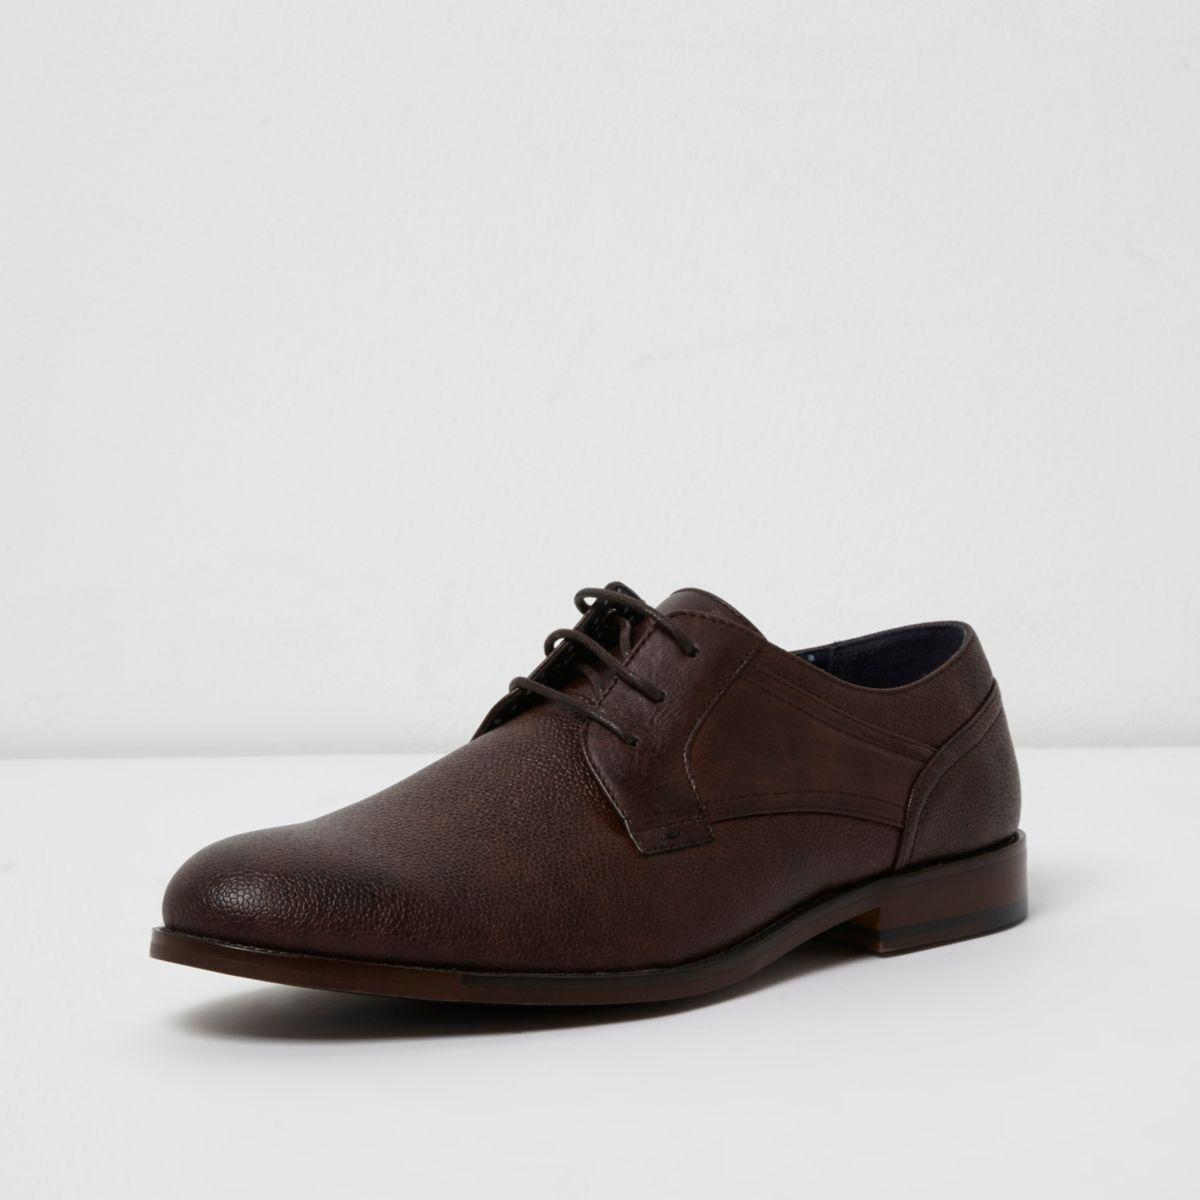 River Island Smart Shoes Uk